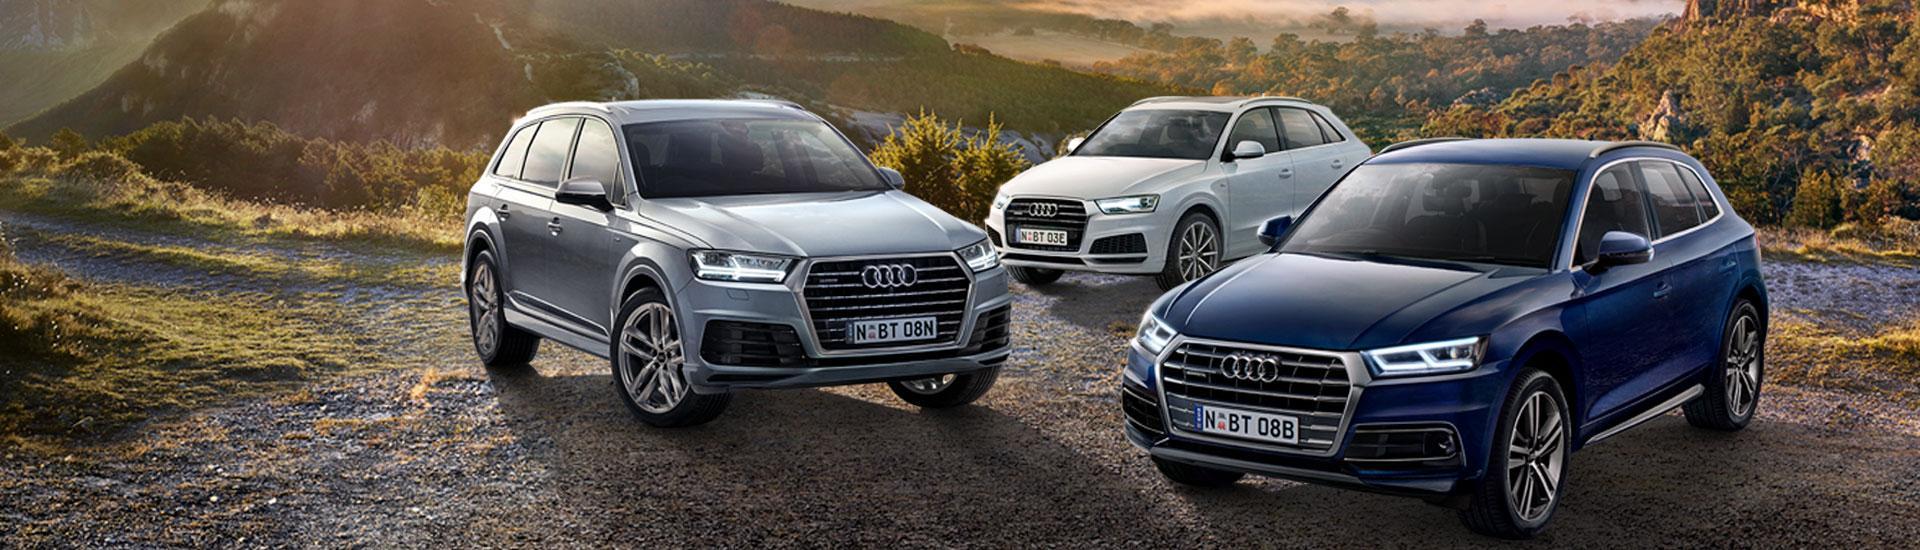 New Audi Cars for Sale in Australia - carsales.com.au